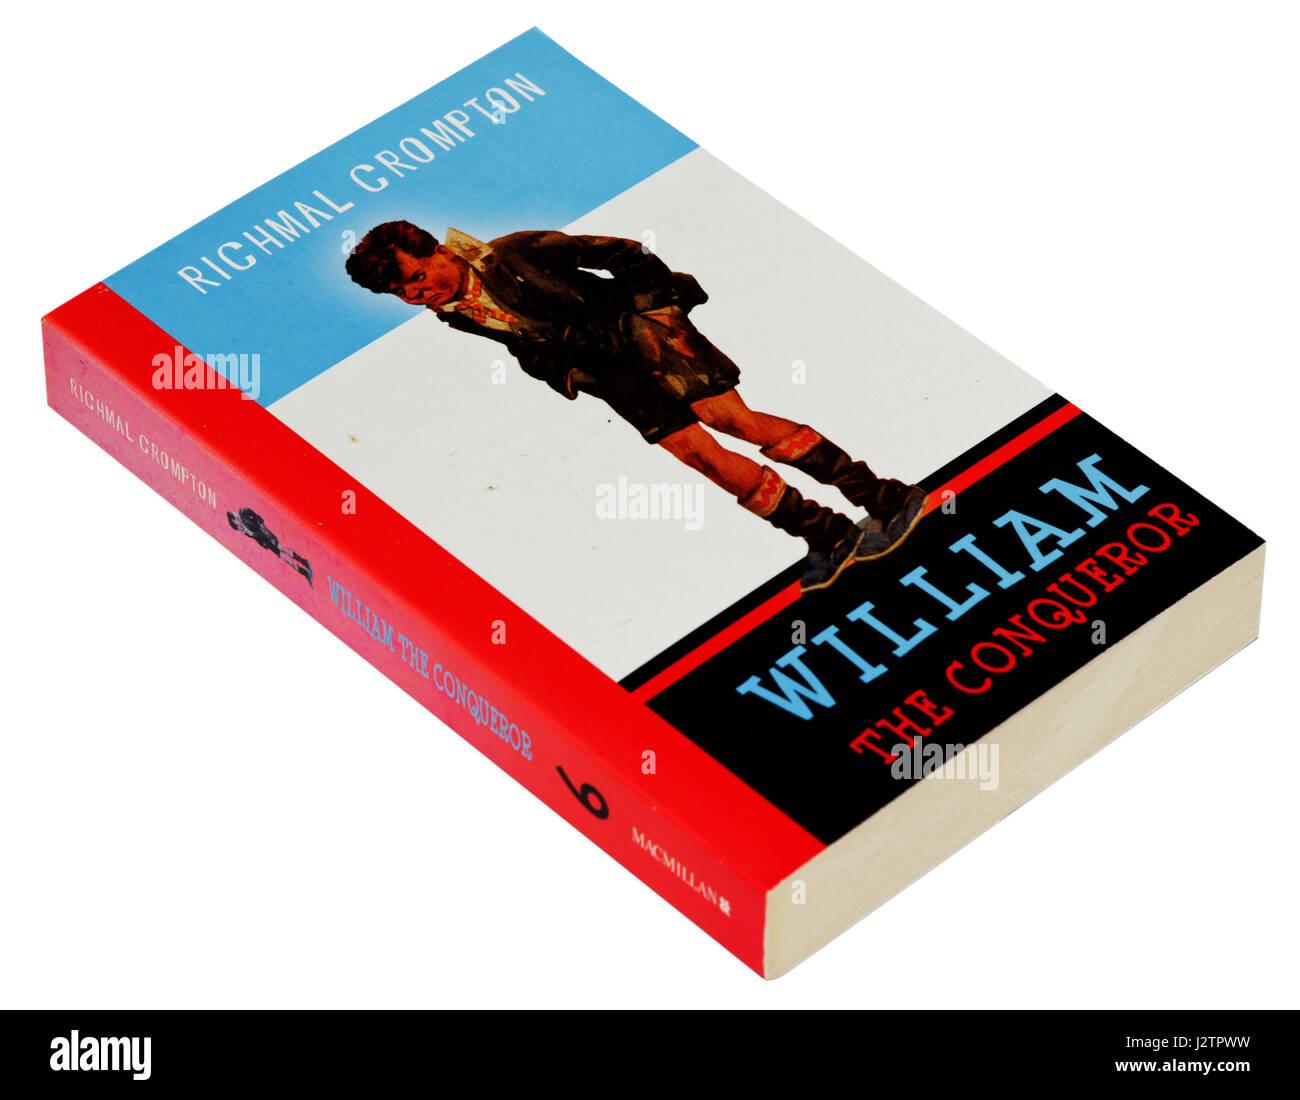 William the Conqueror by Richmal Crompton - Stock Image